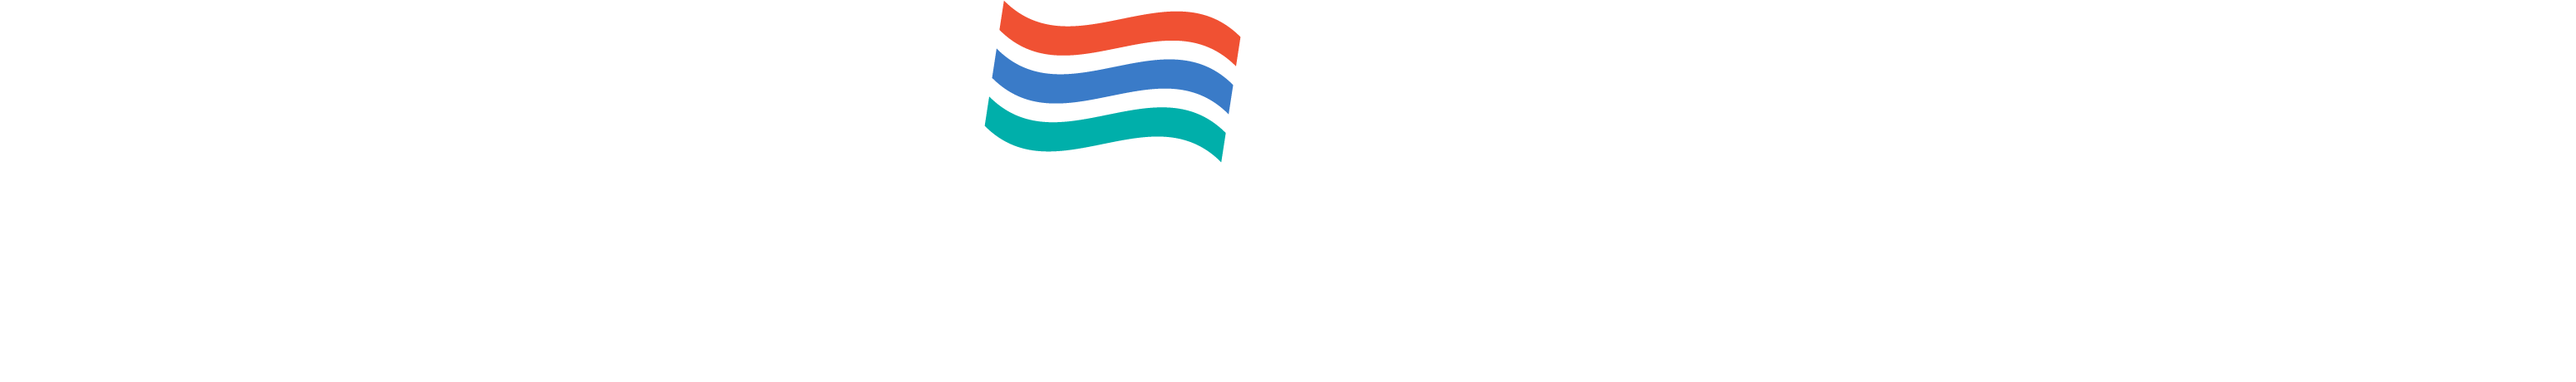 The Compliance Team logo